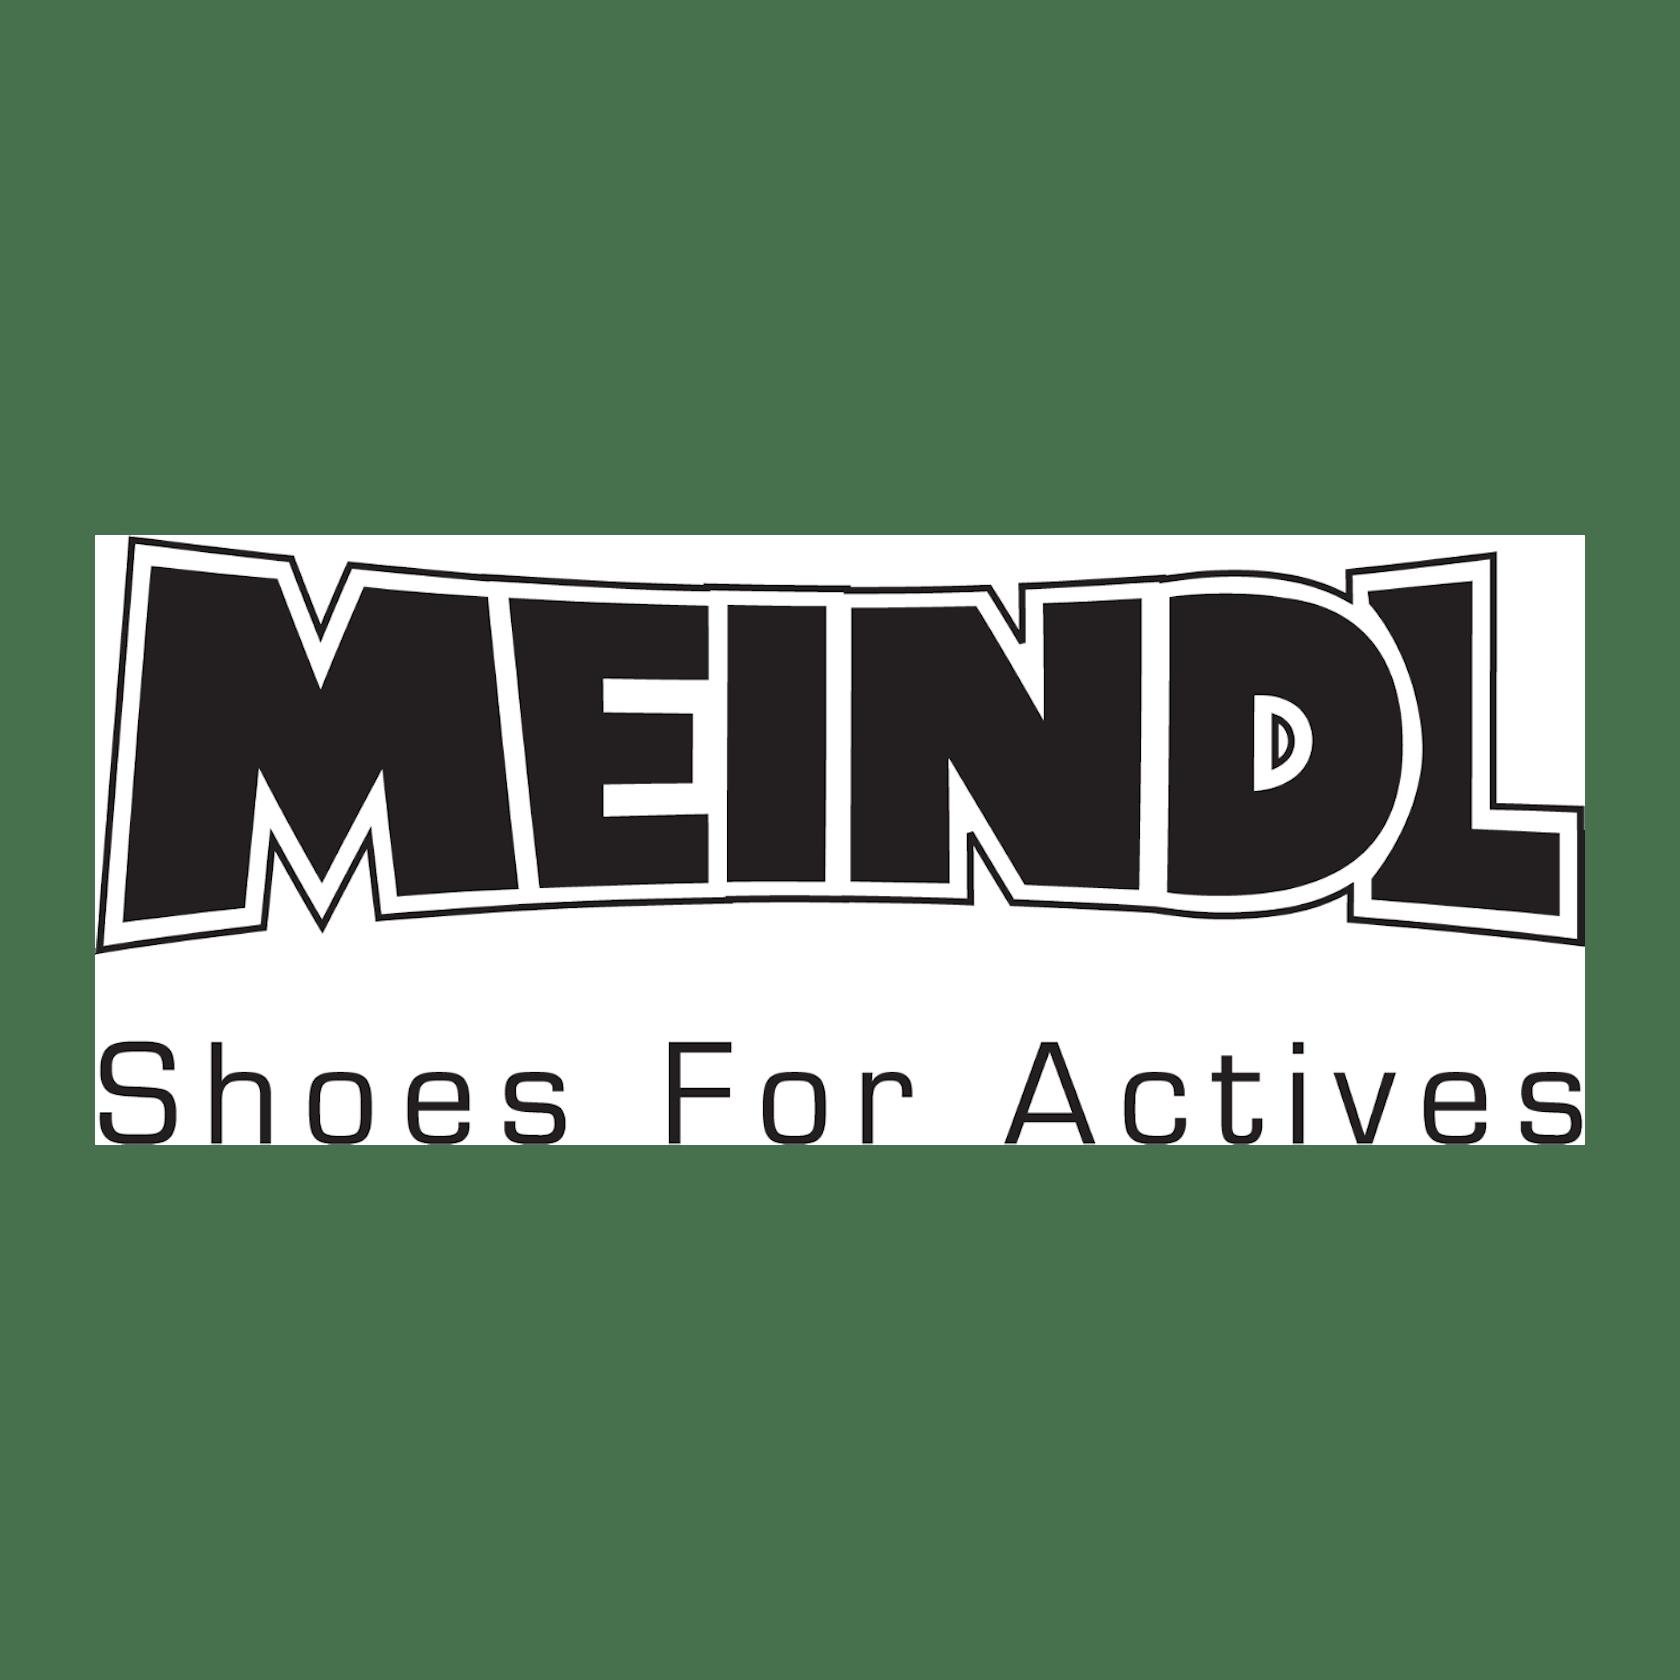 meindl shop online